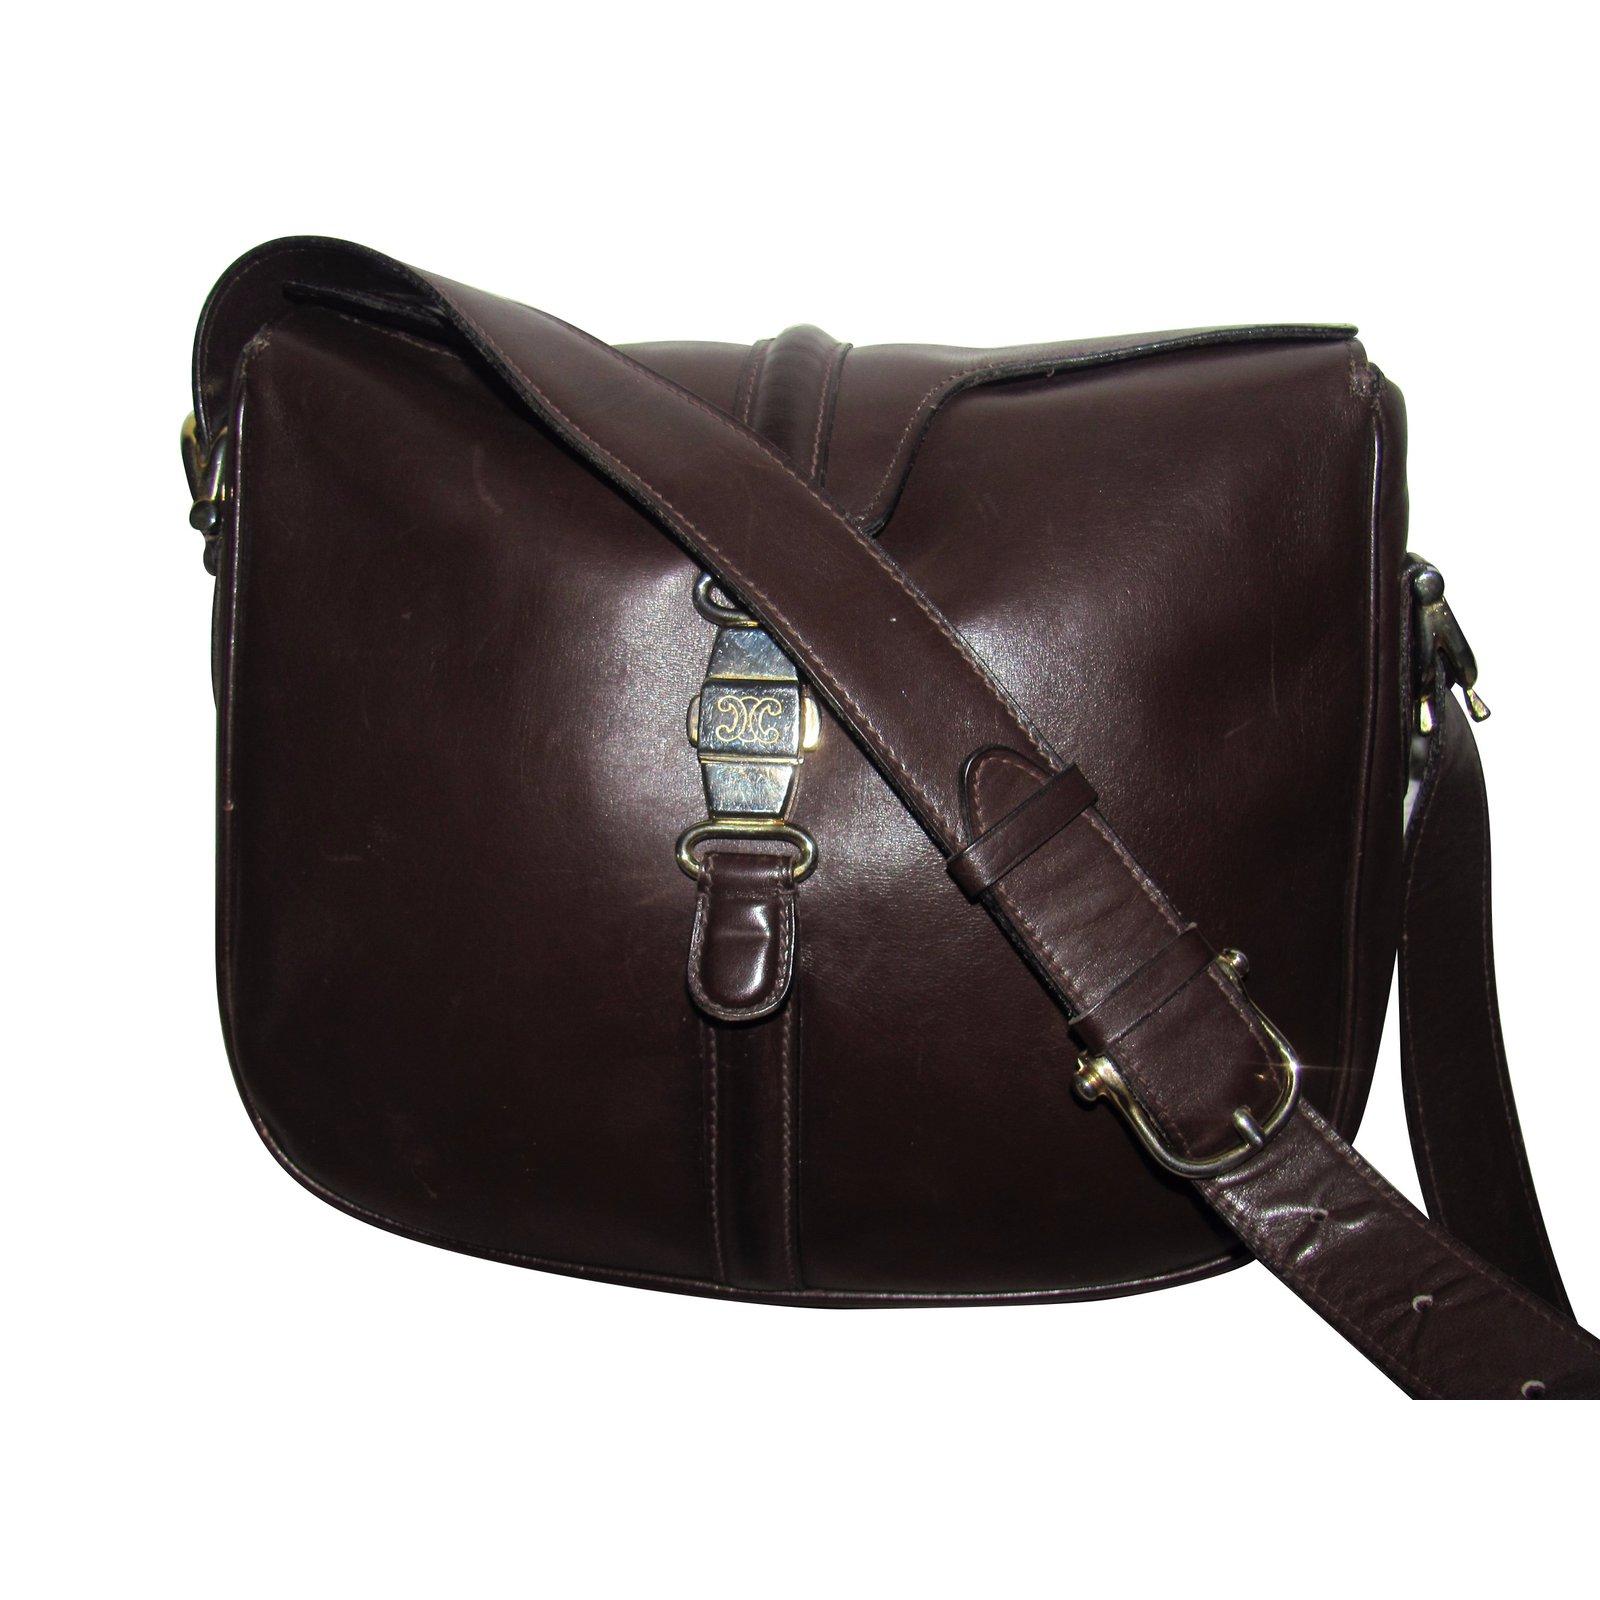 sacs main c line sacs main cuir marron joli. Black Bedroom Furniture Sets. Home Design Ideas